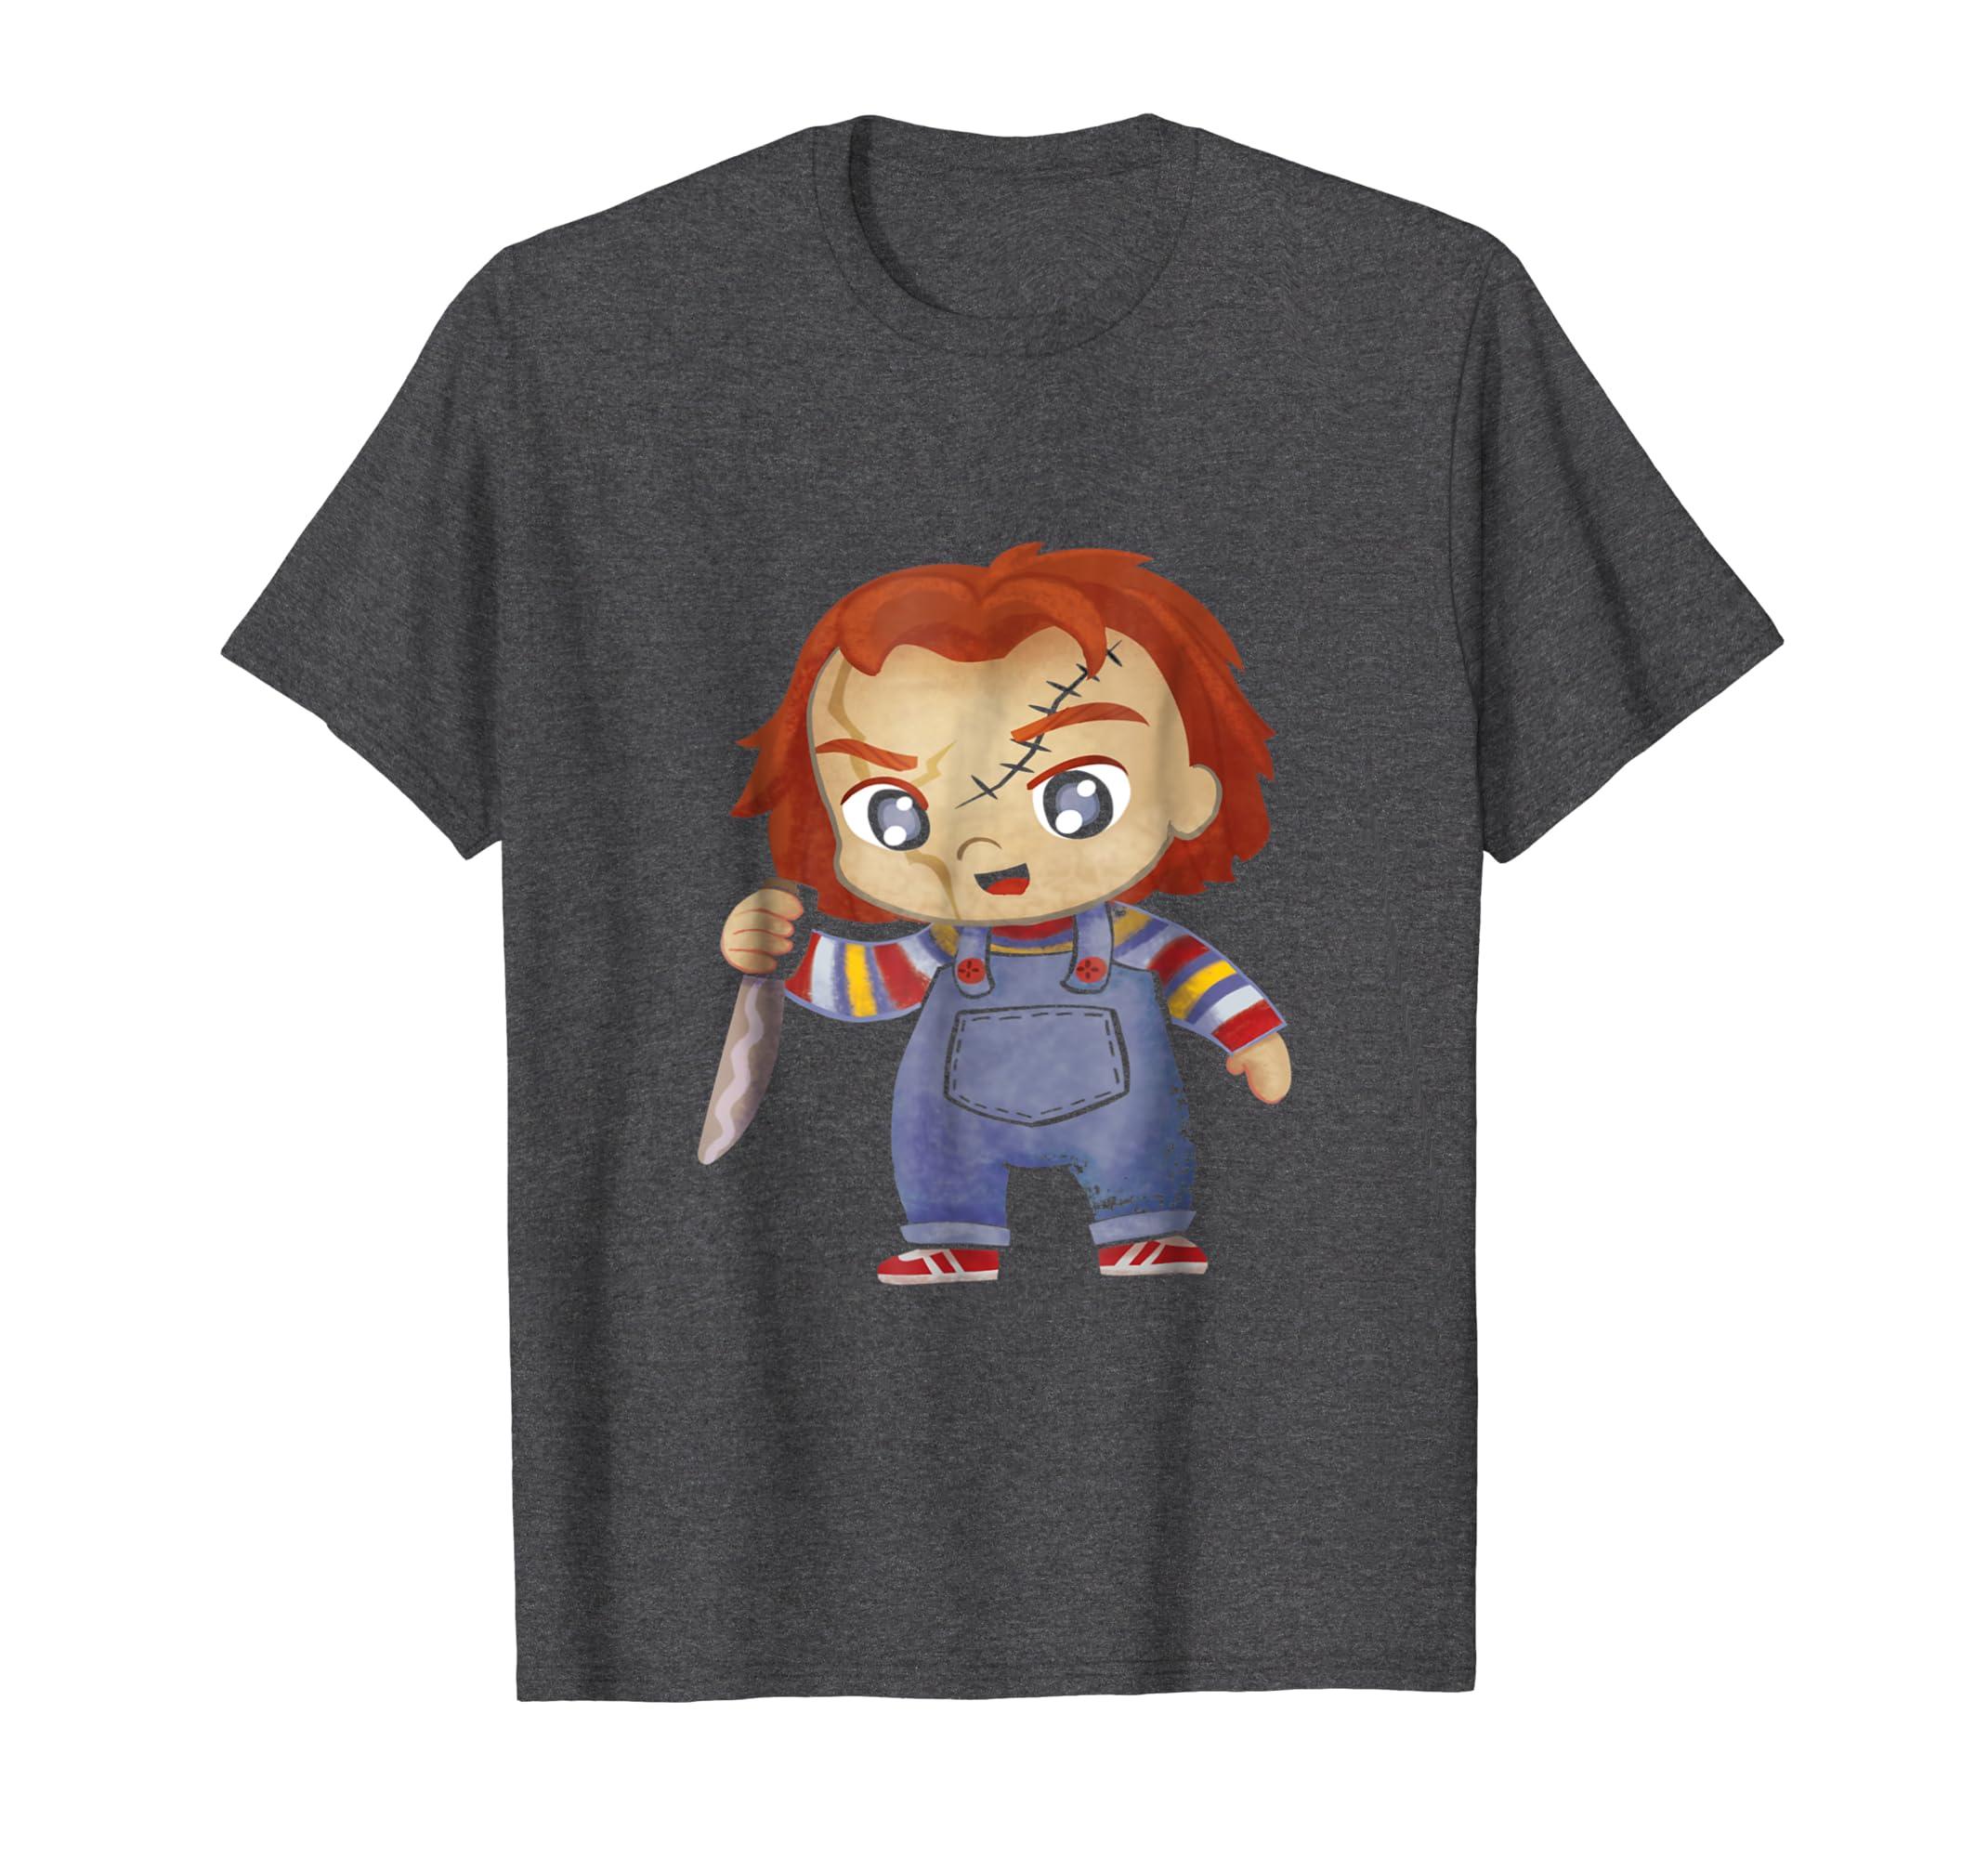 f5760a733 HC Chucky Childs Play Halloween costume t shirt-Colonhue – Colonhue.com